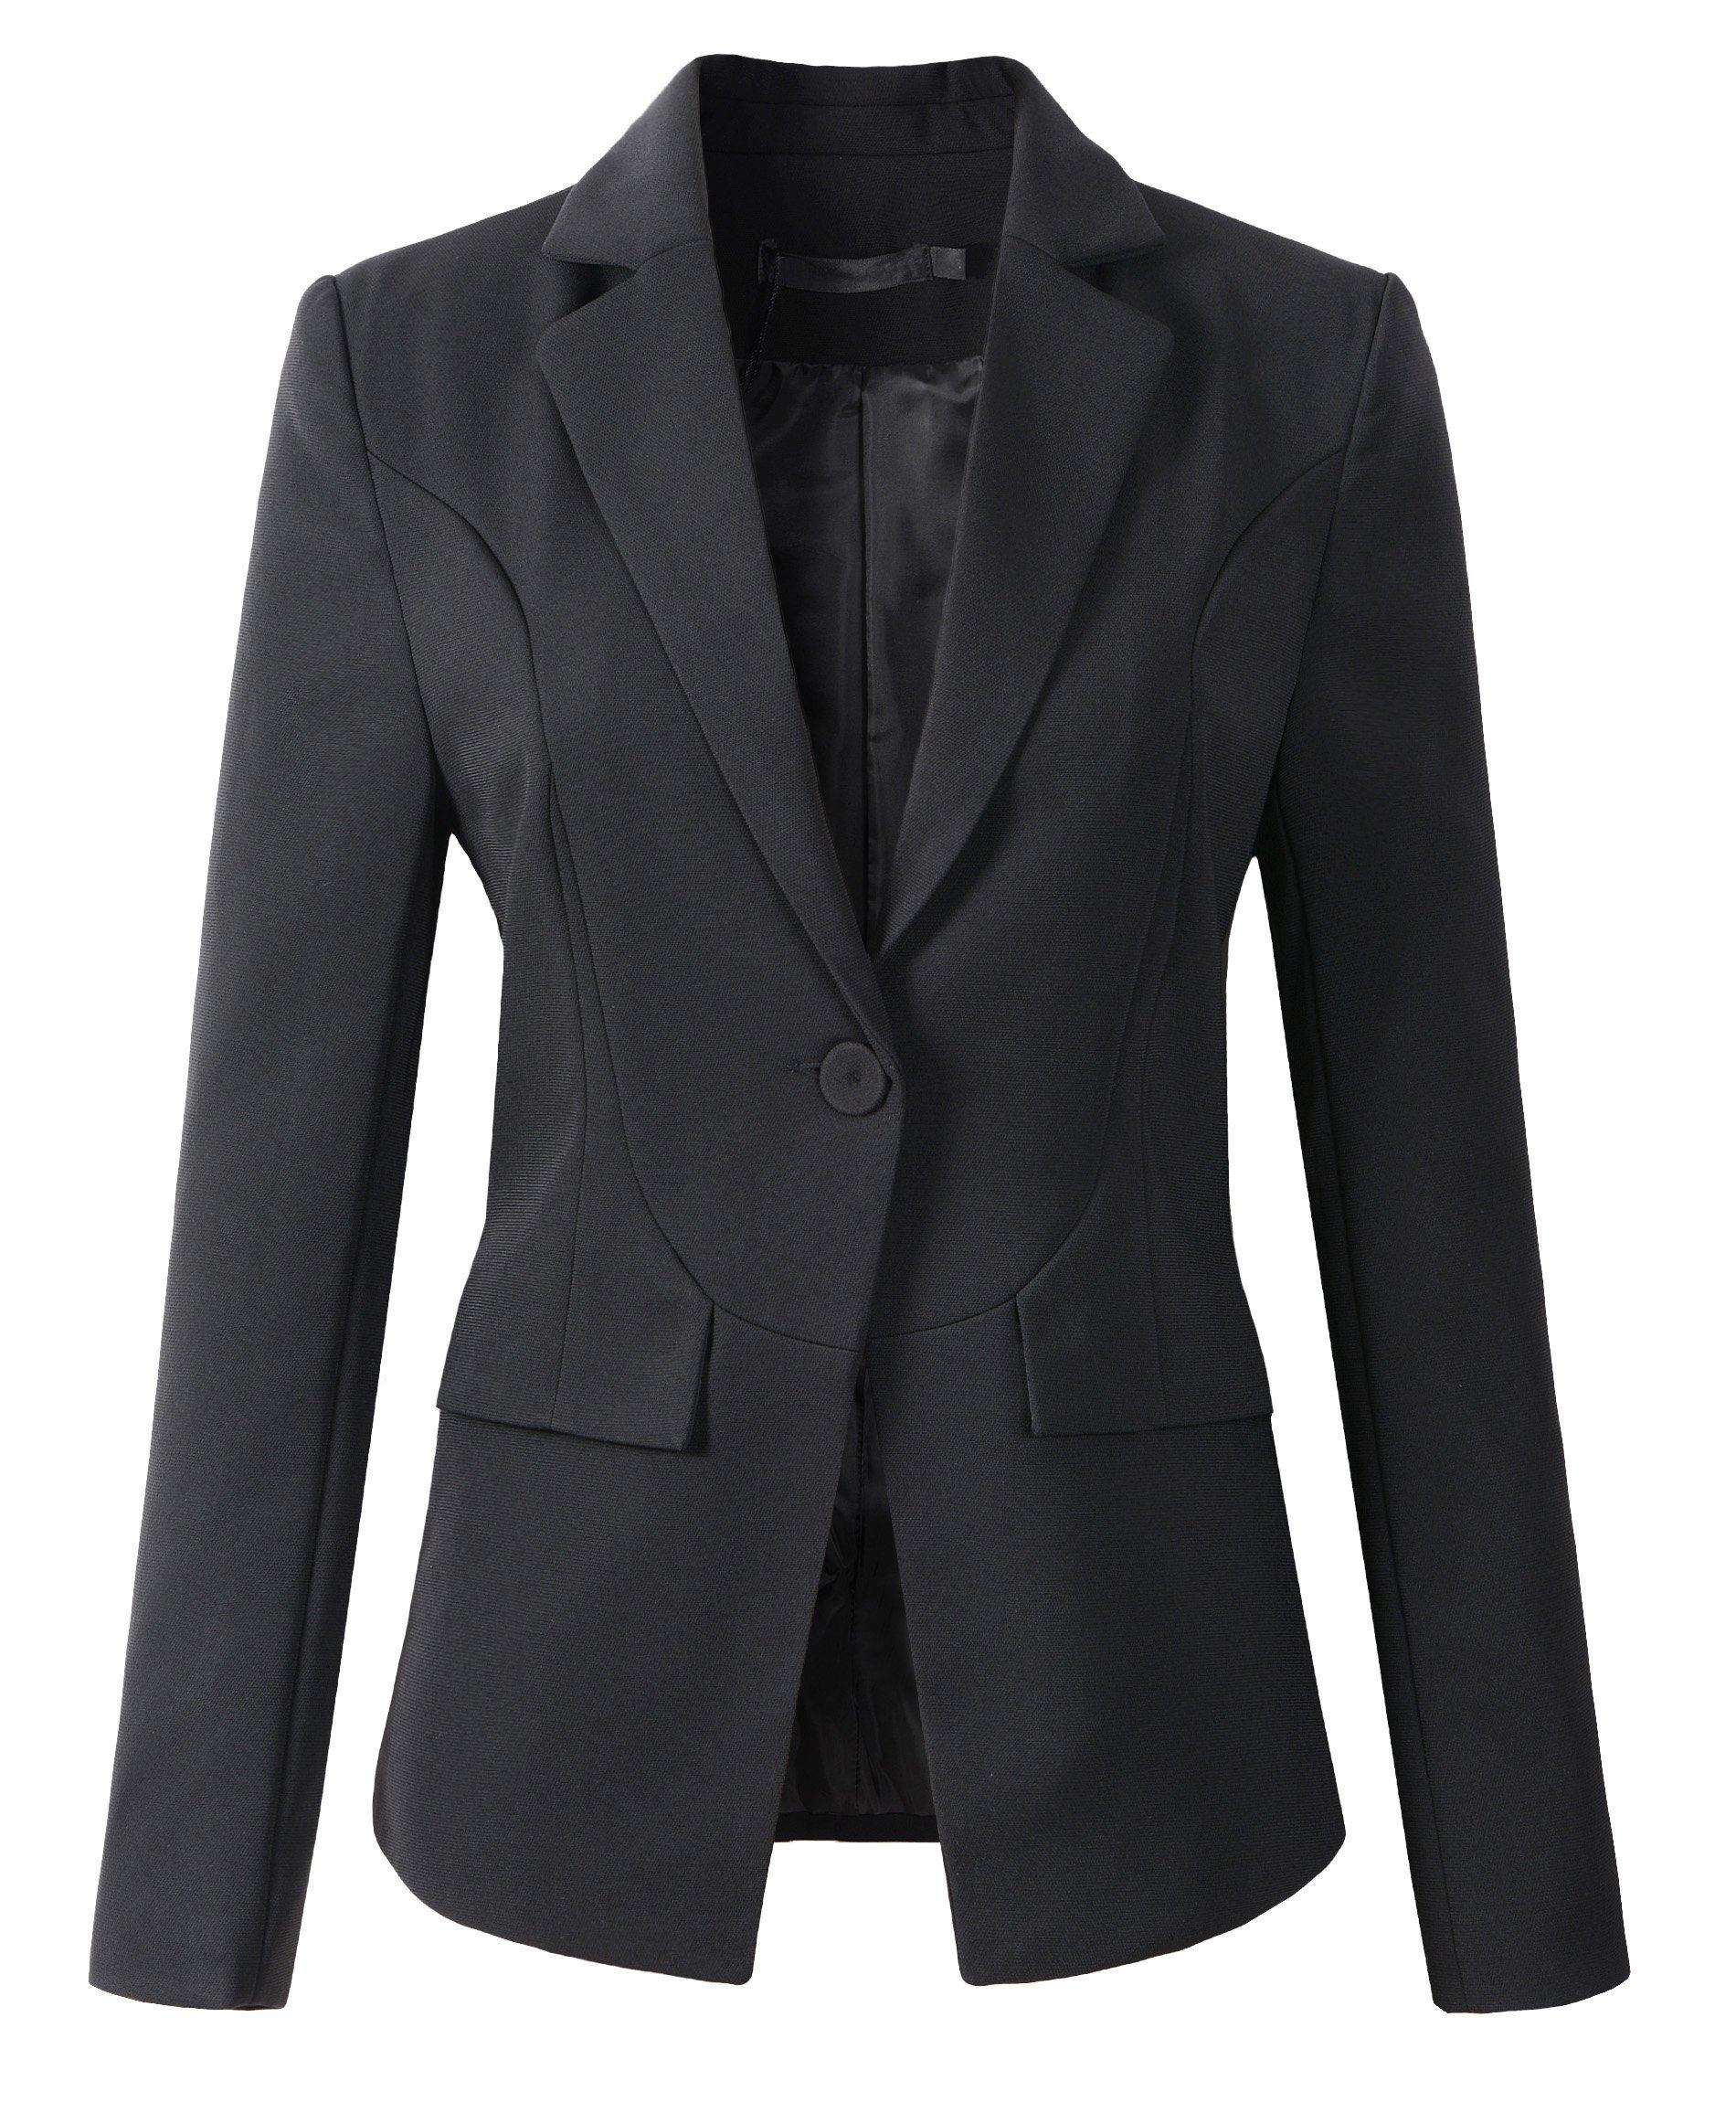 Womens Formal One Button Boyfriend Blazer Jacket (L, 1513Black)